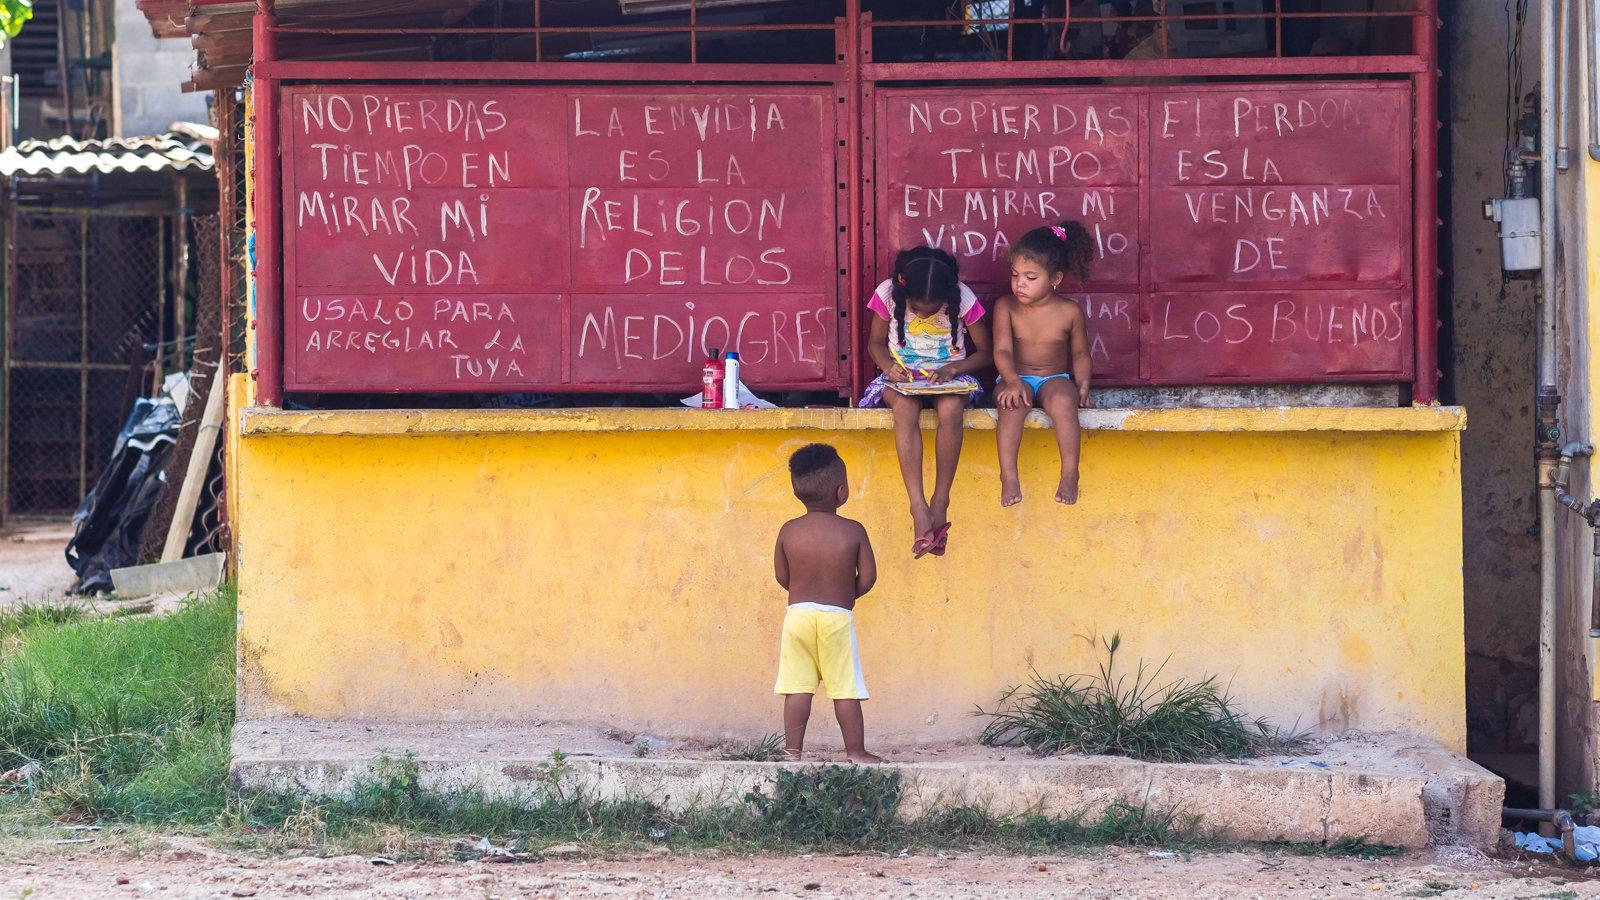 08_Cuba_2014_Erik_Hart_Lensculture_1600px.jpg